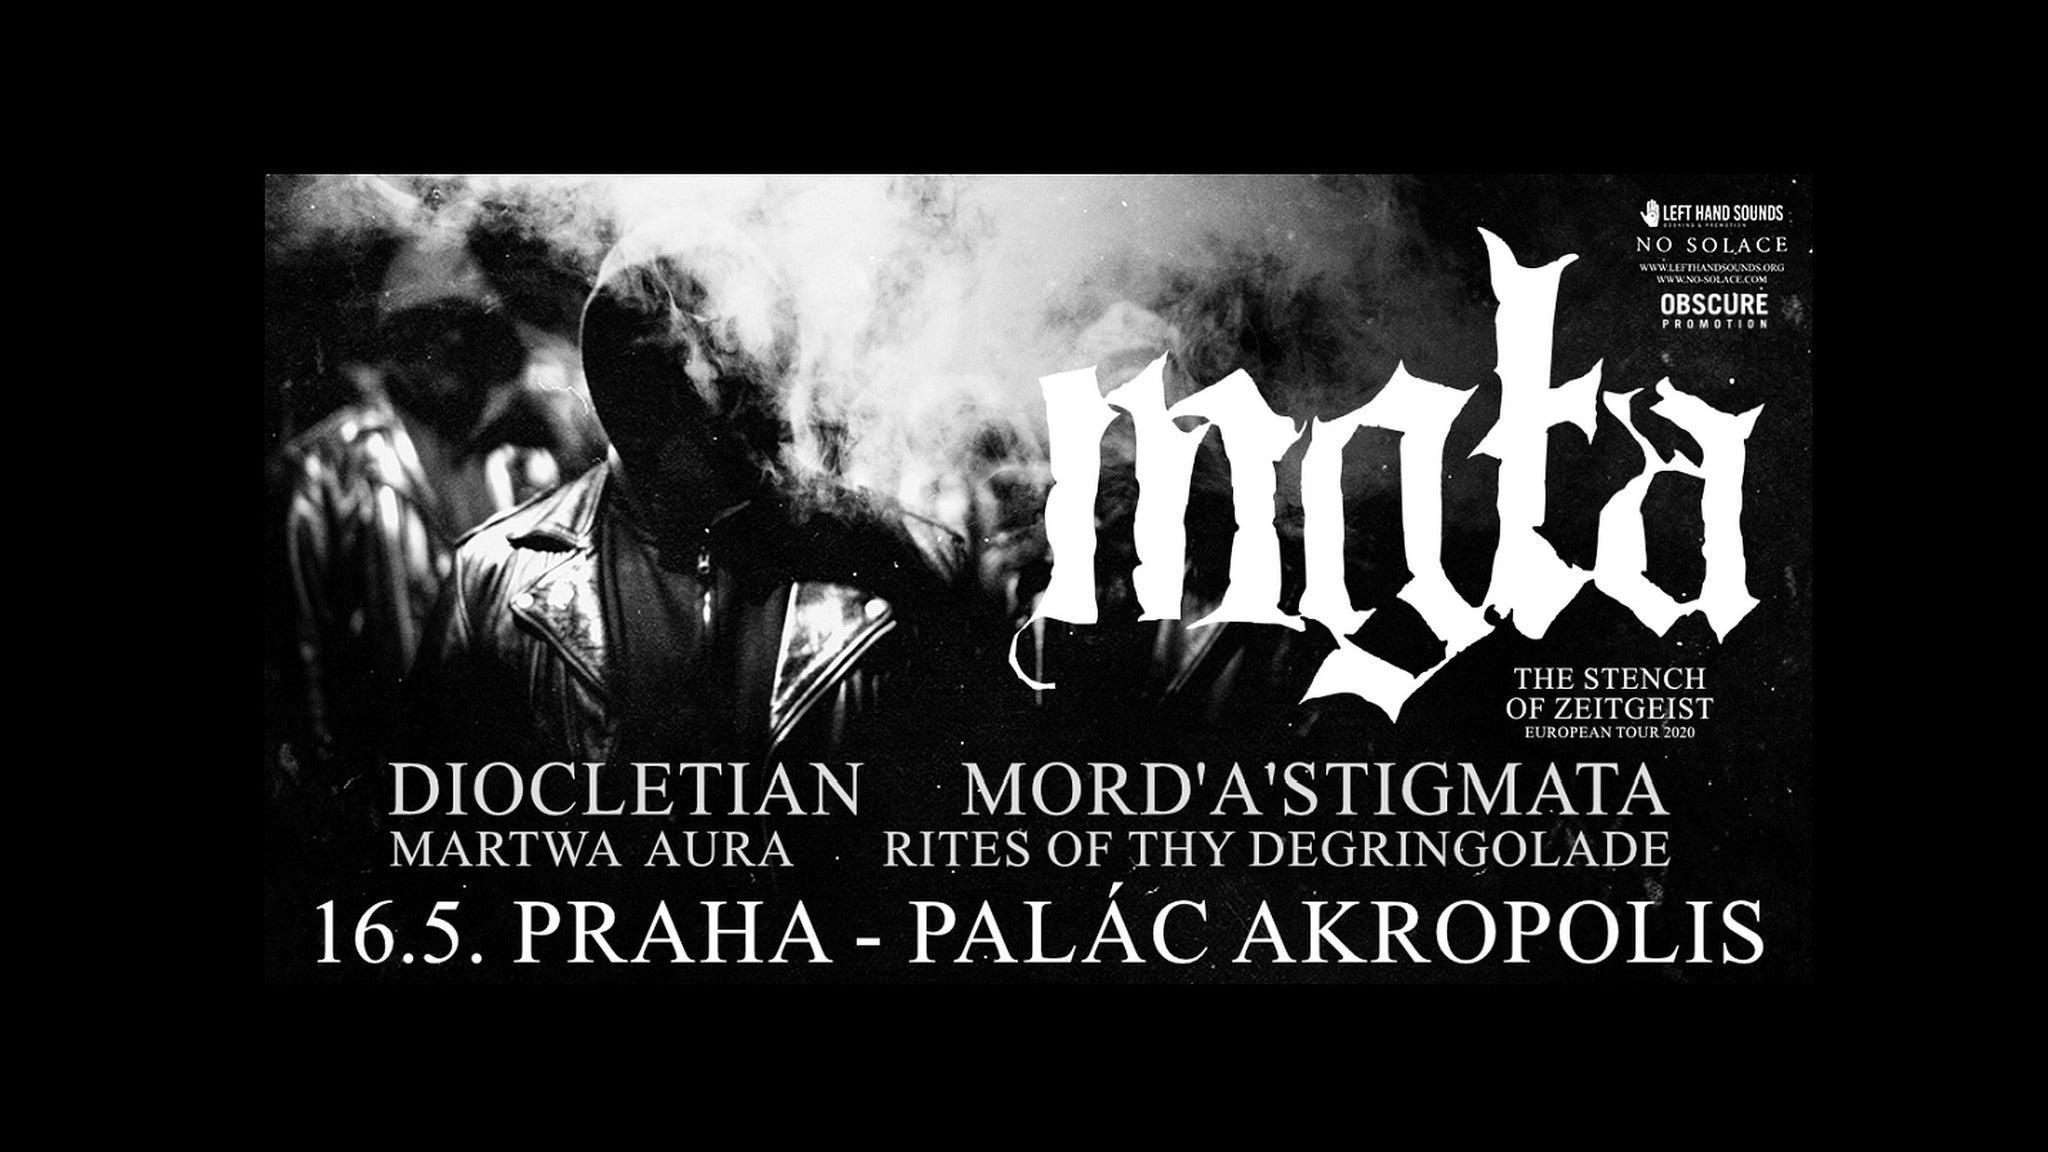 MGLA, Diocletian, Mord'A'Stigmata, Martwa Aura, Rites of Thy Degringolade